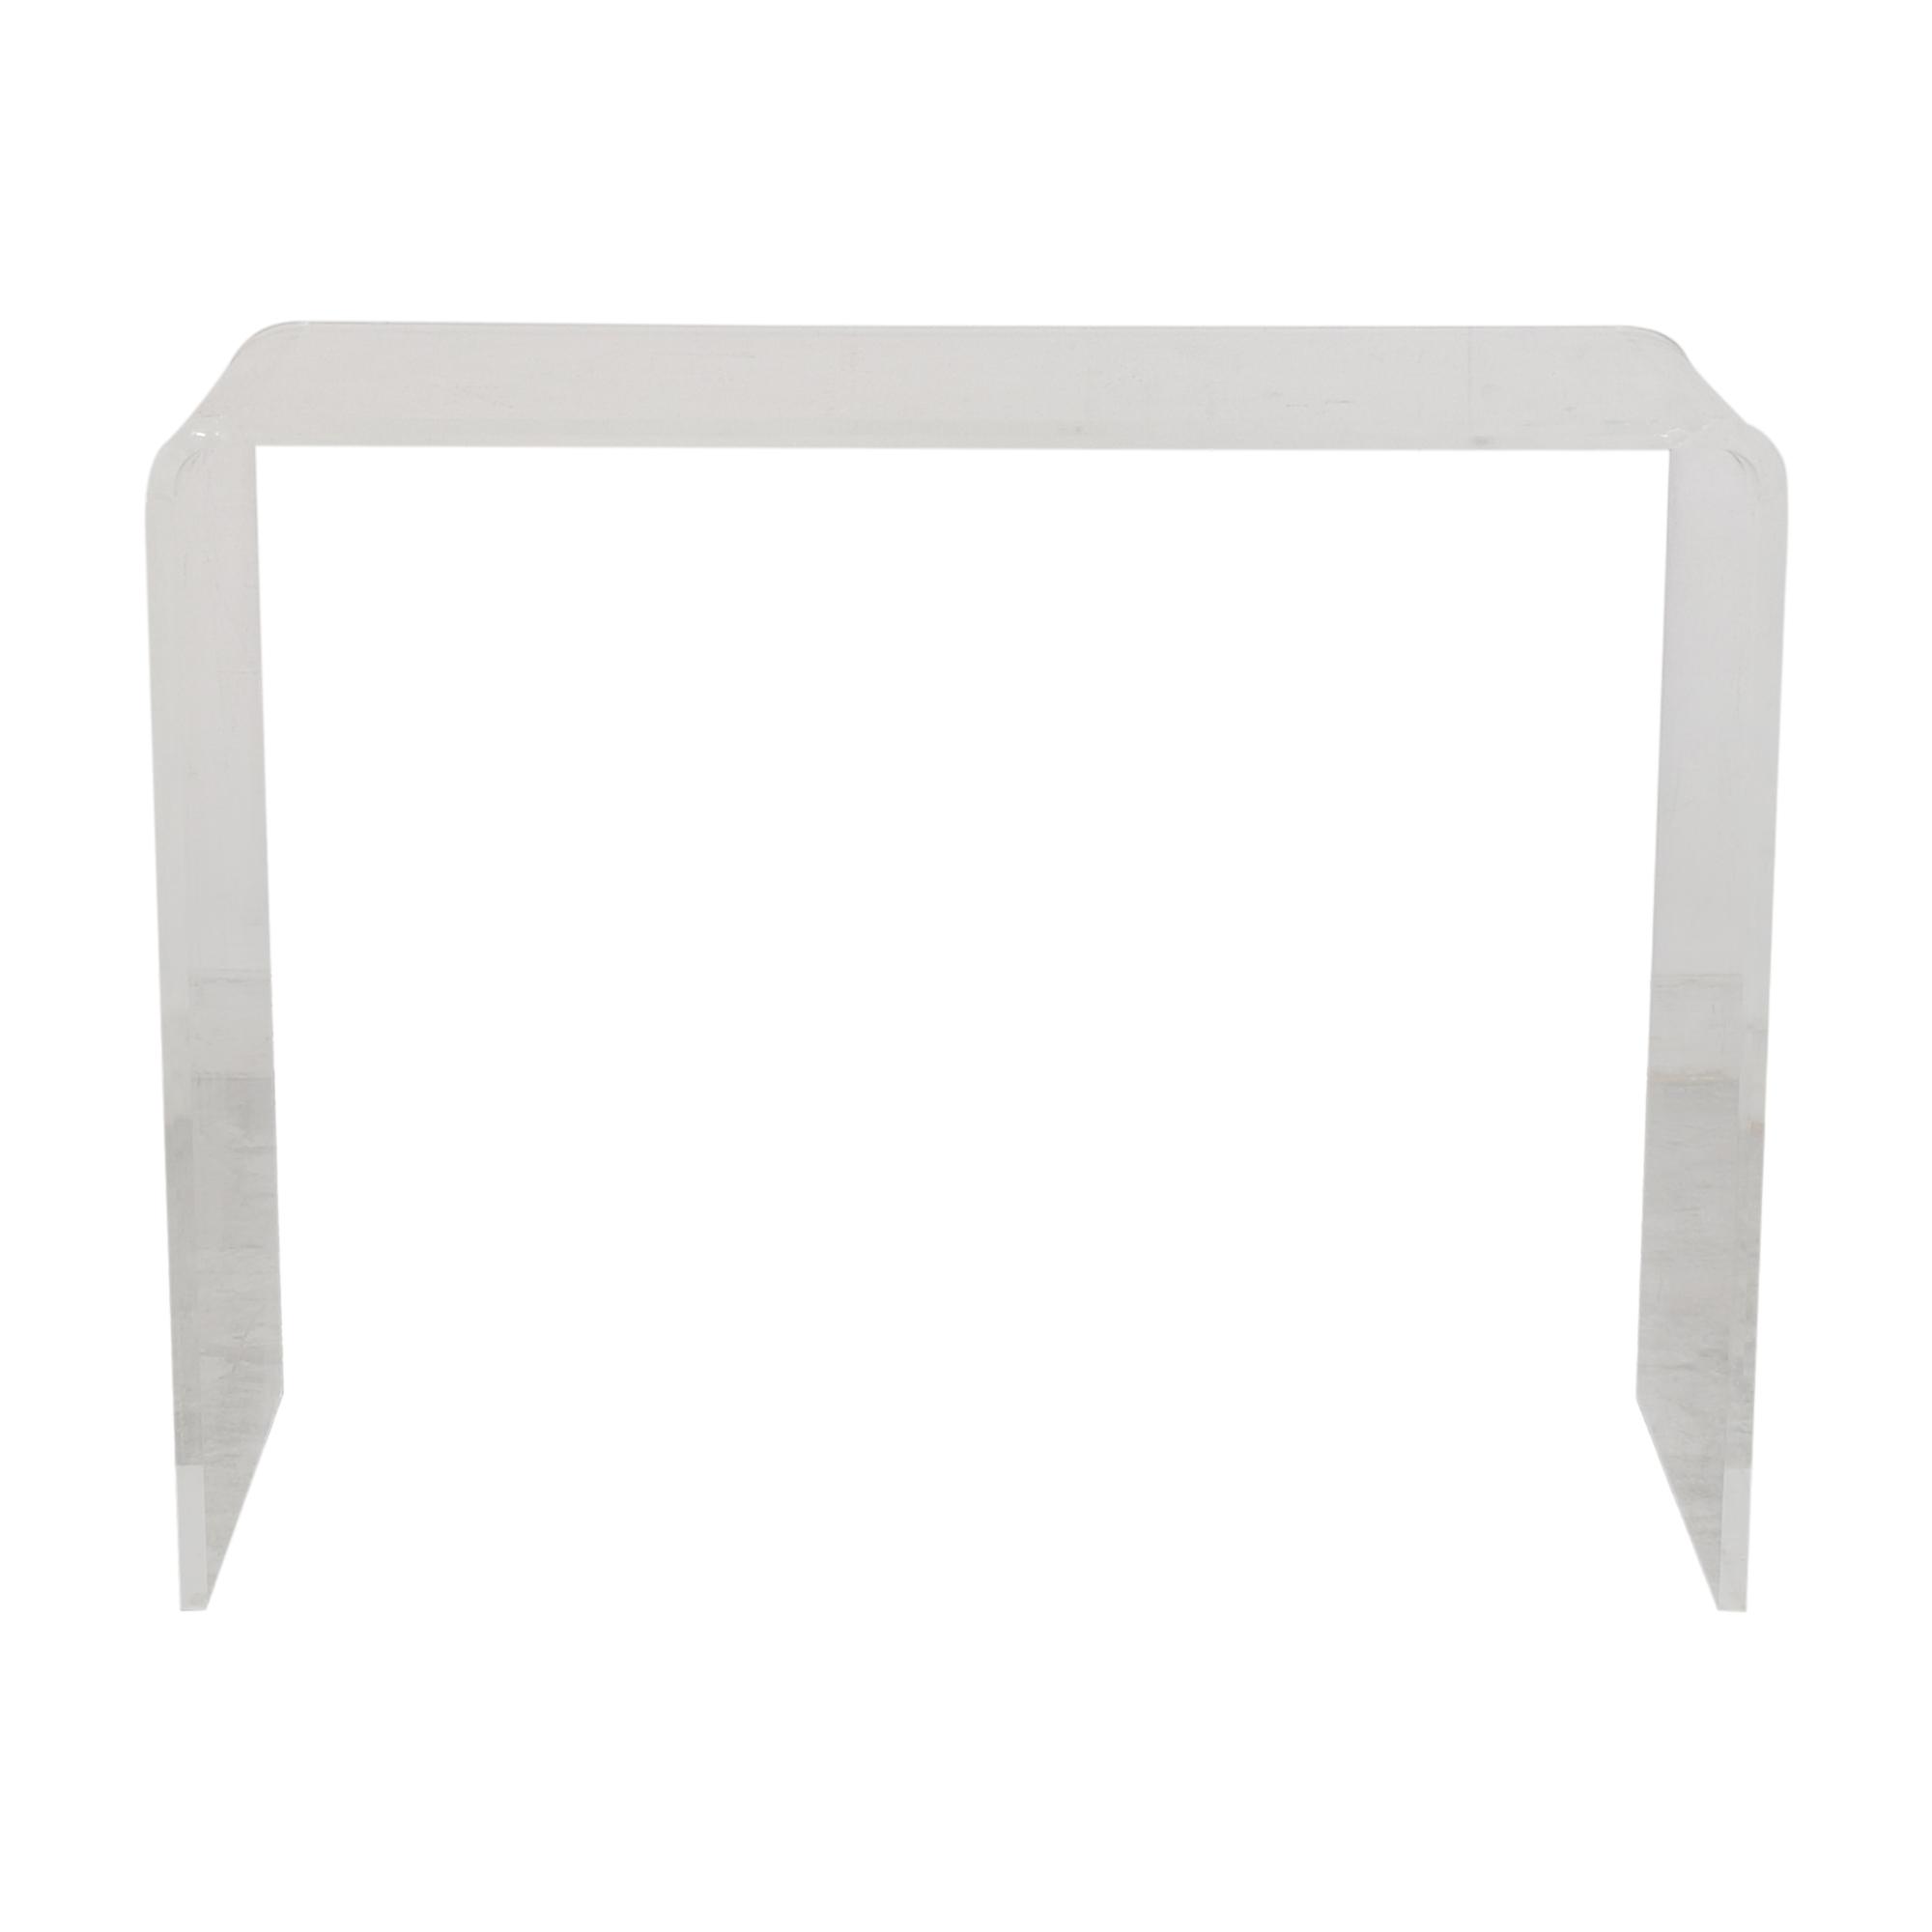 CB2 CB2 Peekaboo Console Table on sale